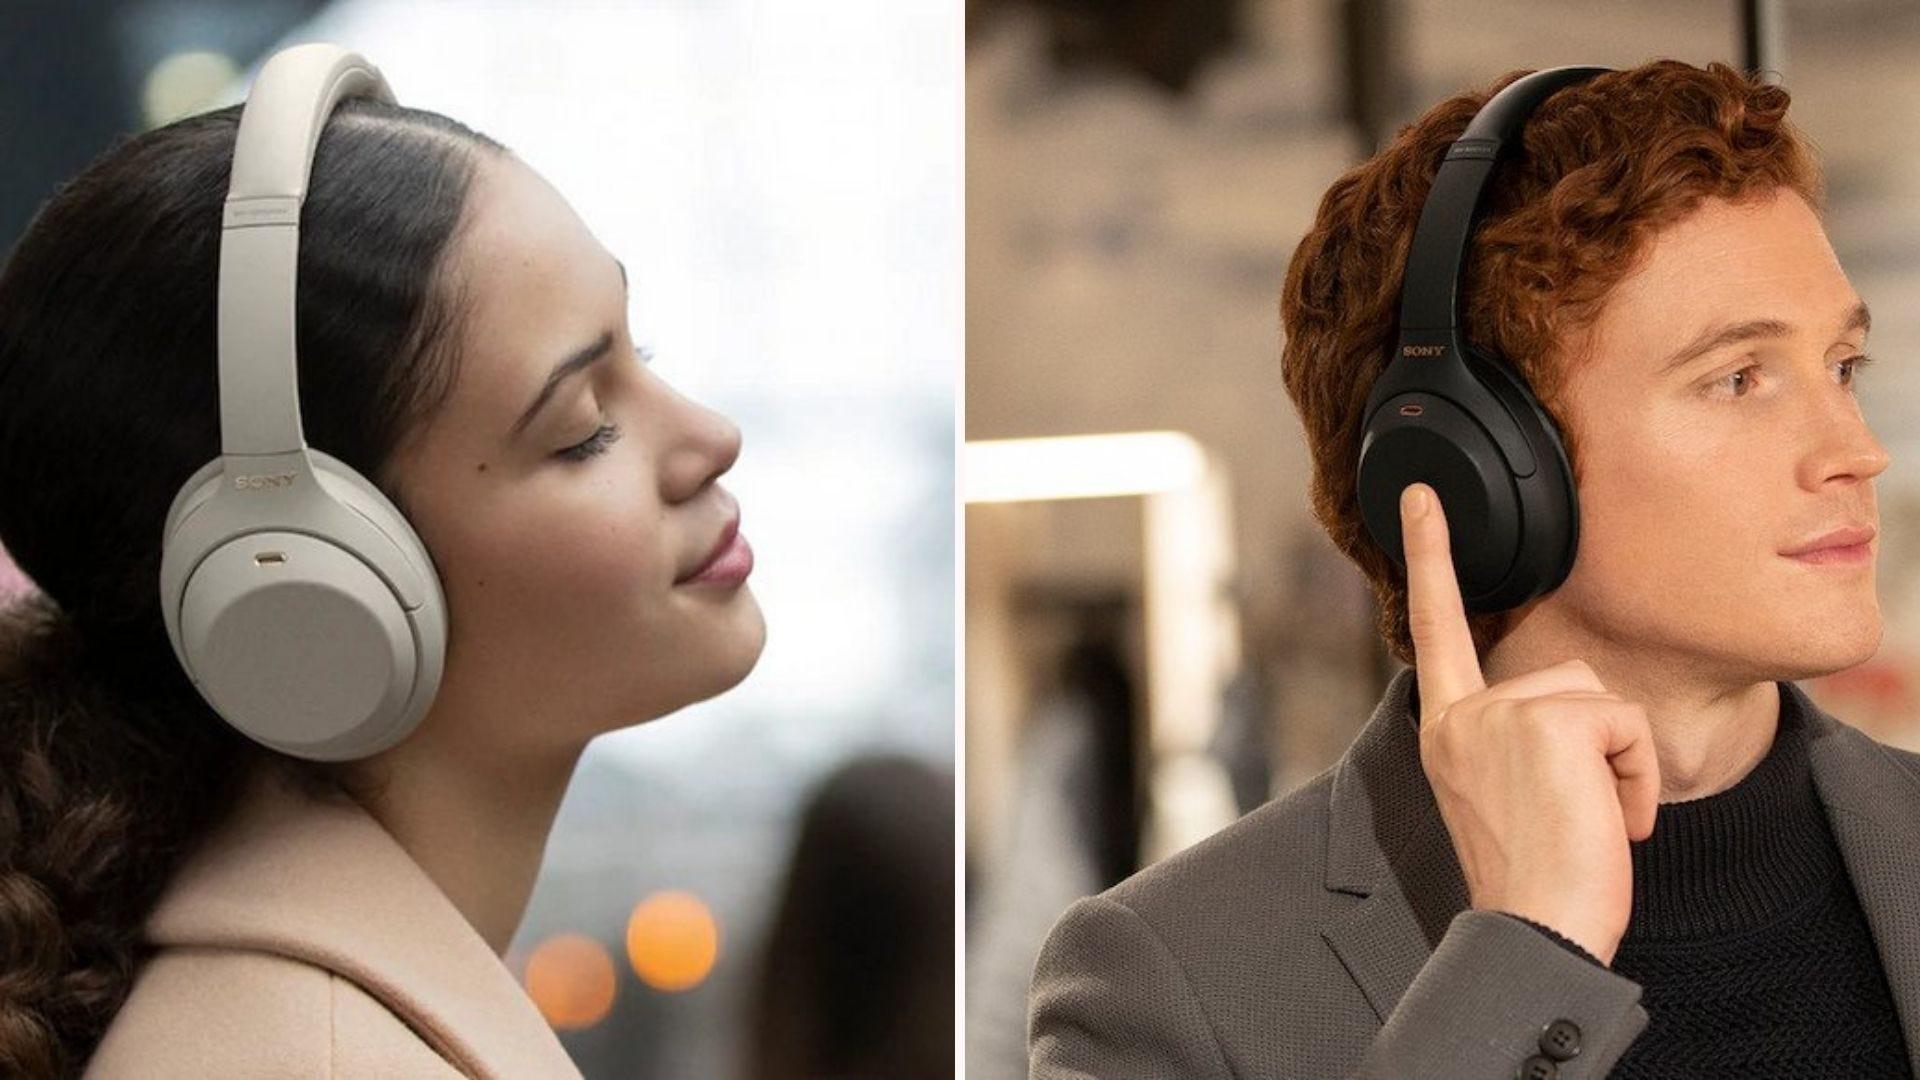 A woman wearing white headphones; a man wearing black headphones